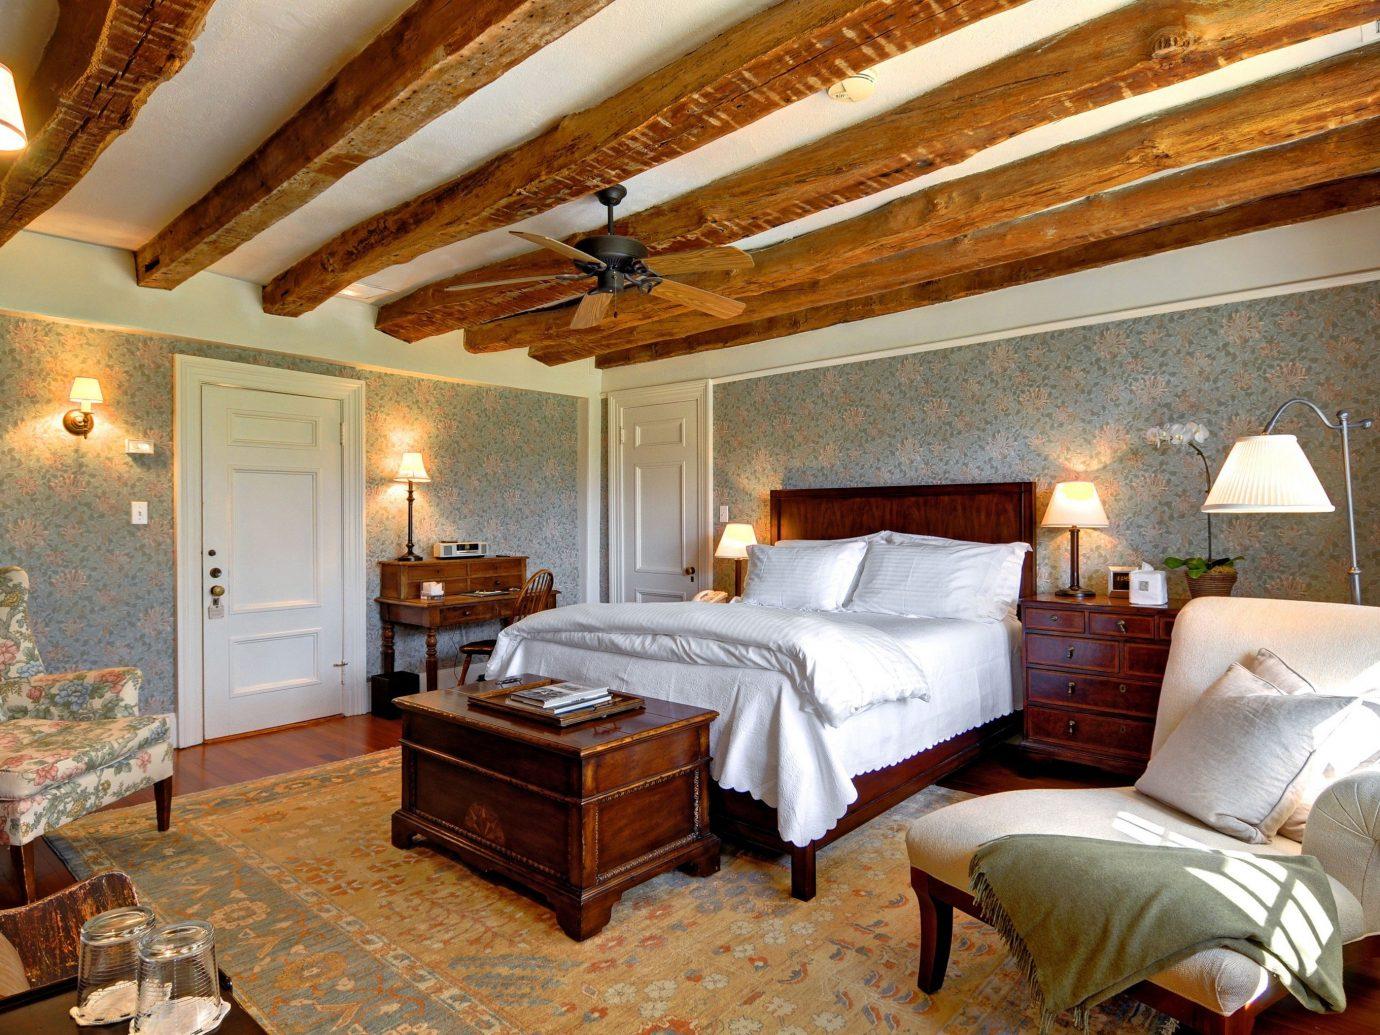 Trip Ideas indoor floor wall room property estate cottage living room Suite Bedroom real estate ceiling interior design Villa farmhouse furniture